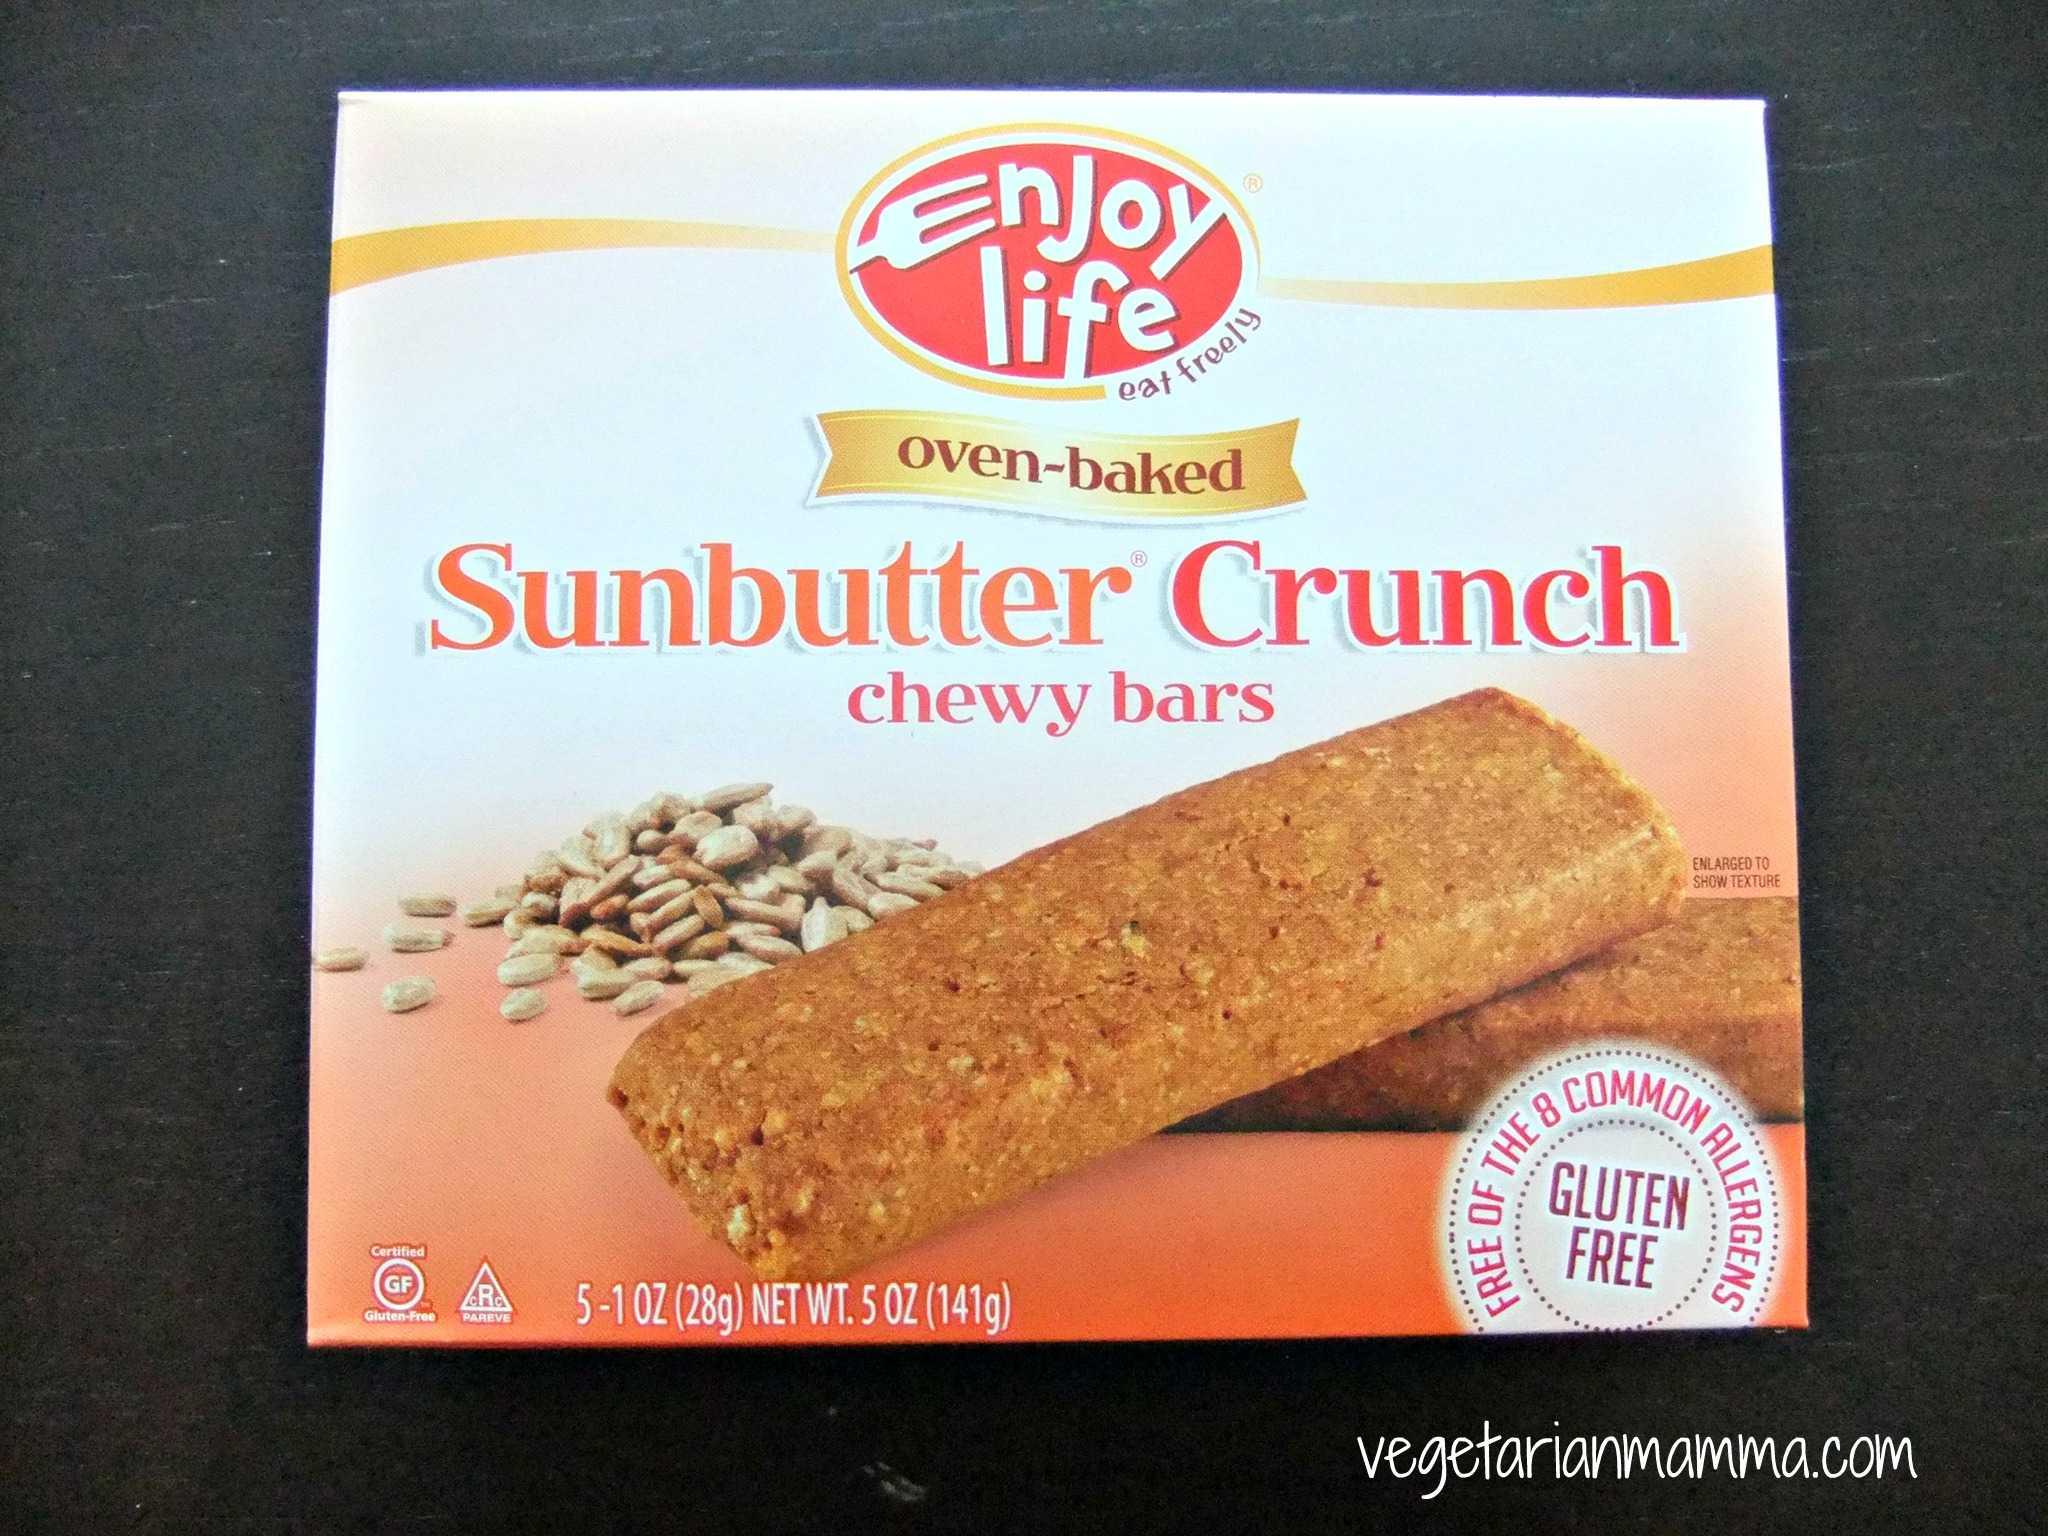 Gluten Free Allergen Free Review: Enjoy Life Chewy Bars